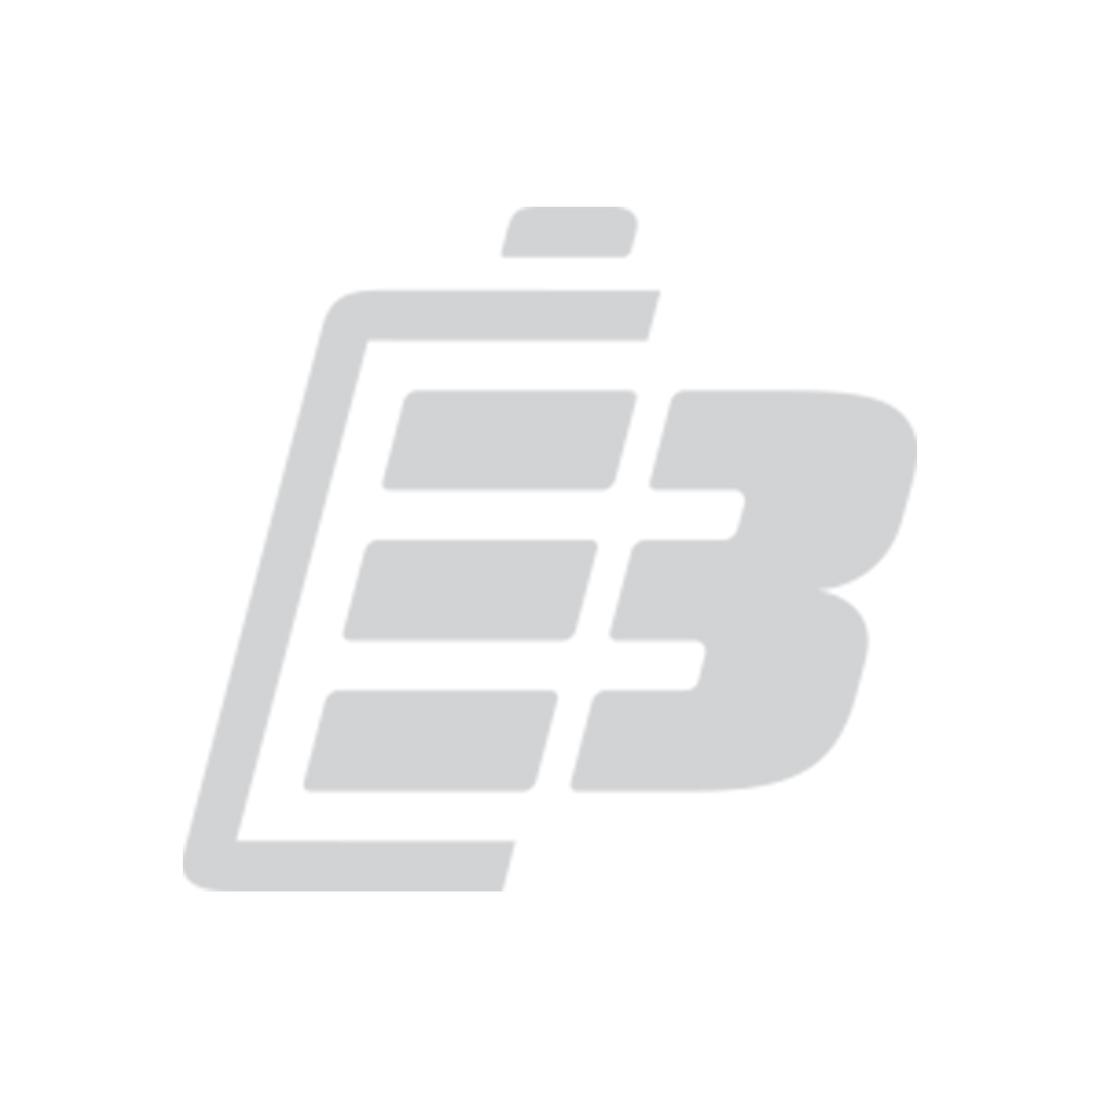 Two-Way radio battery Motorola SX900_1